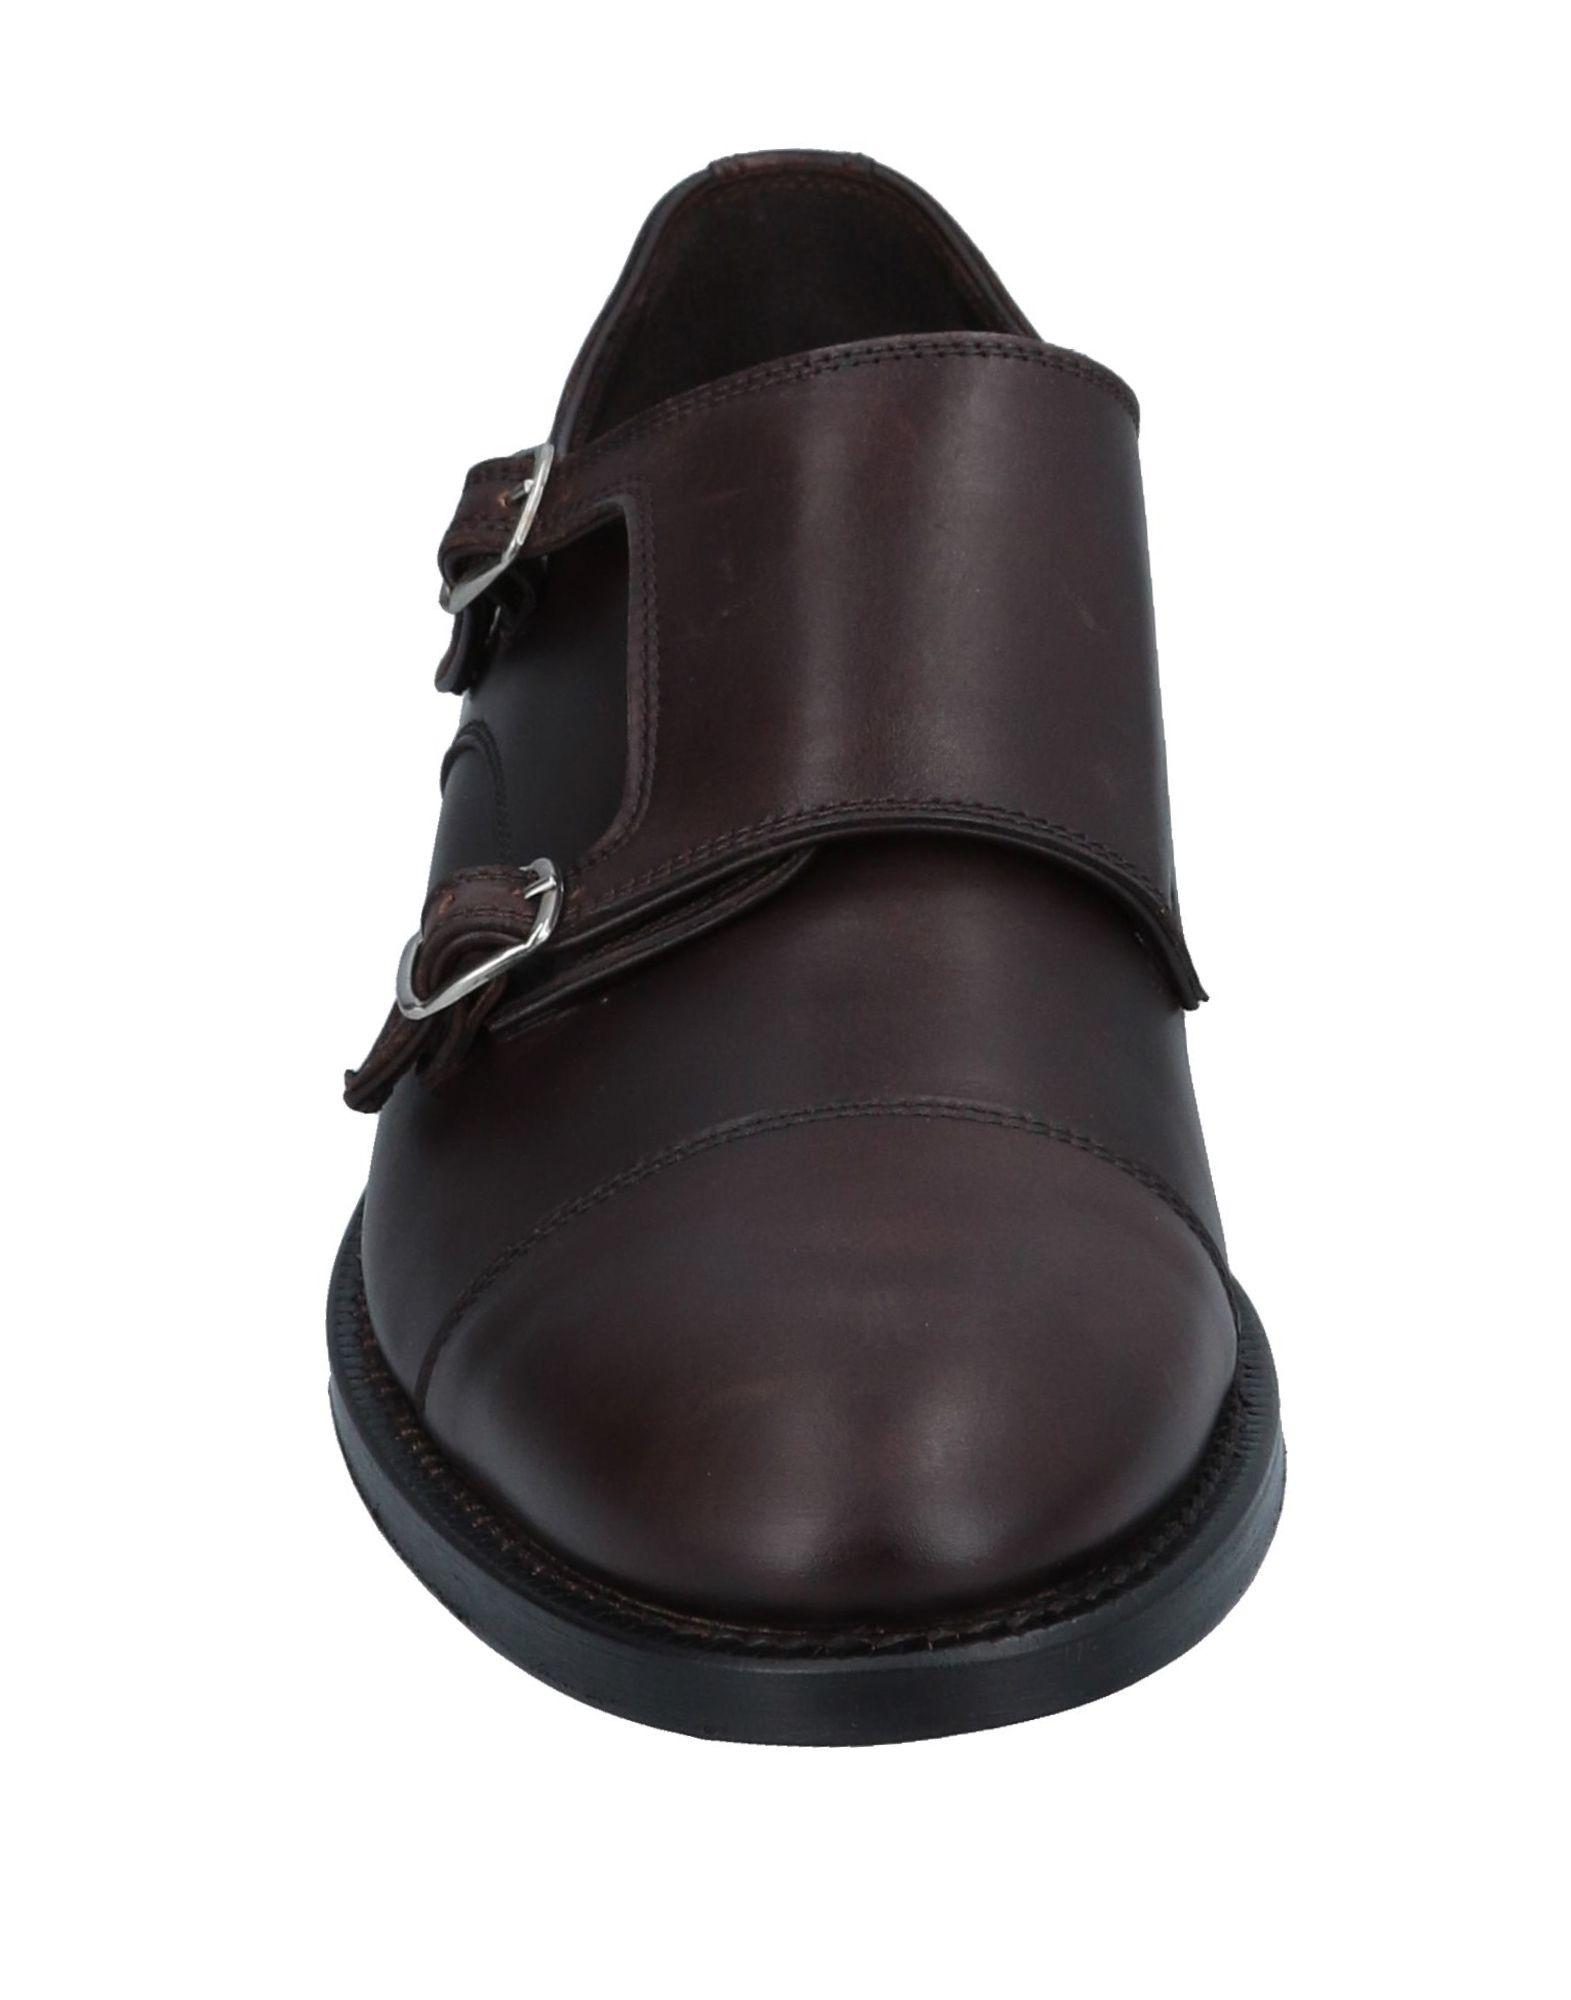 Migliore Migliore Migliore Loafers - Men Migliore Loafers online on  Australia - 11578450AM 5dec34